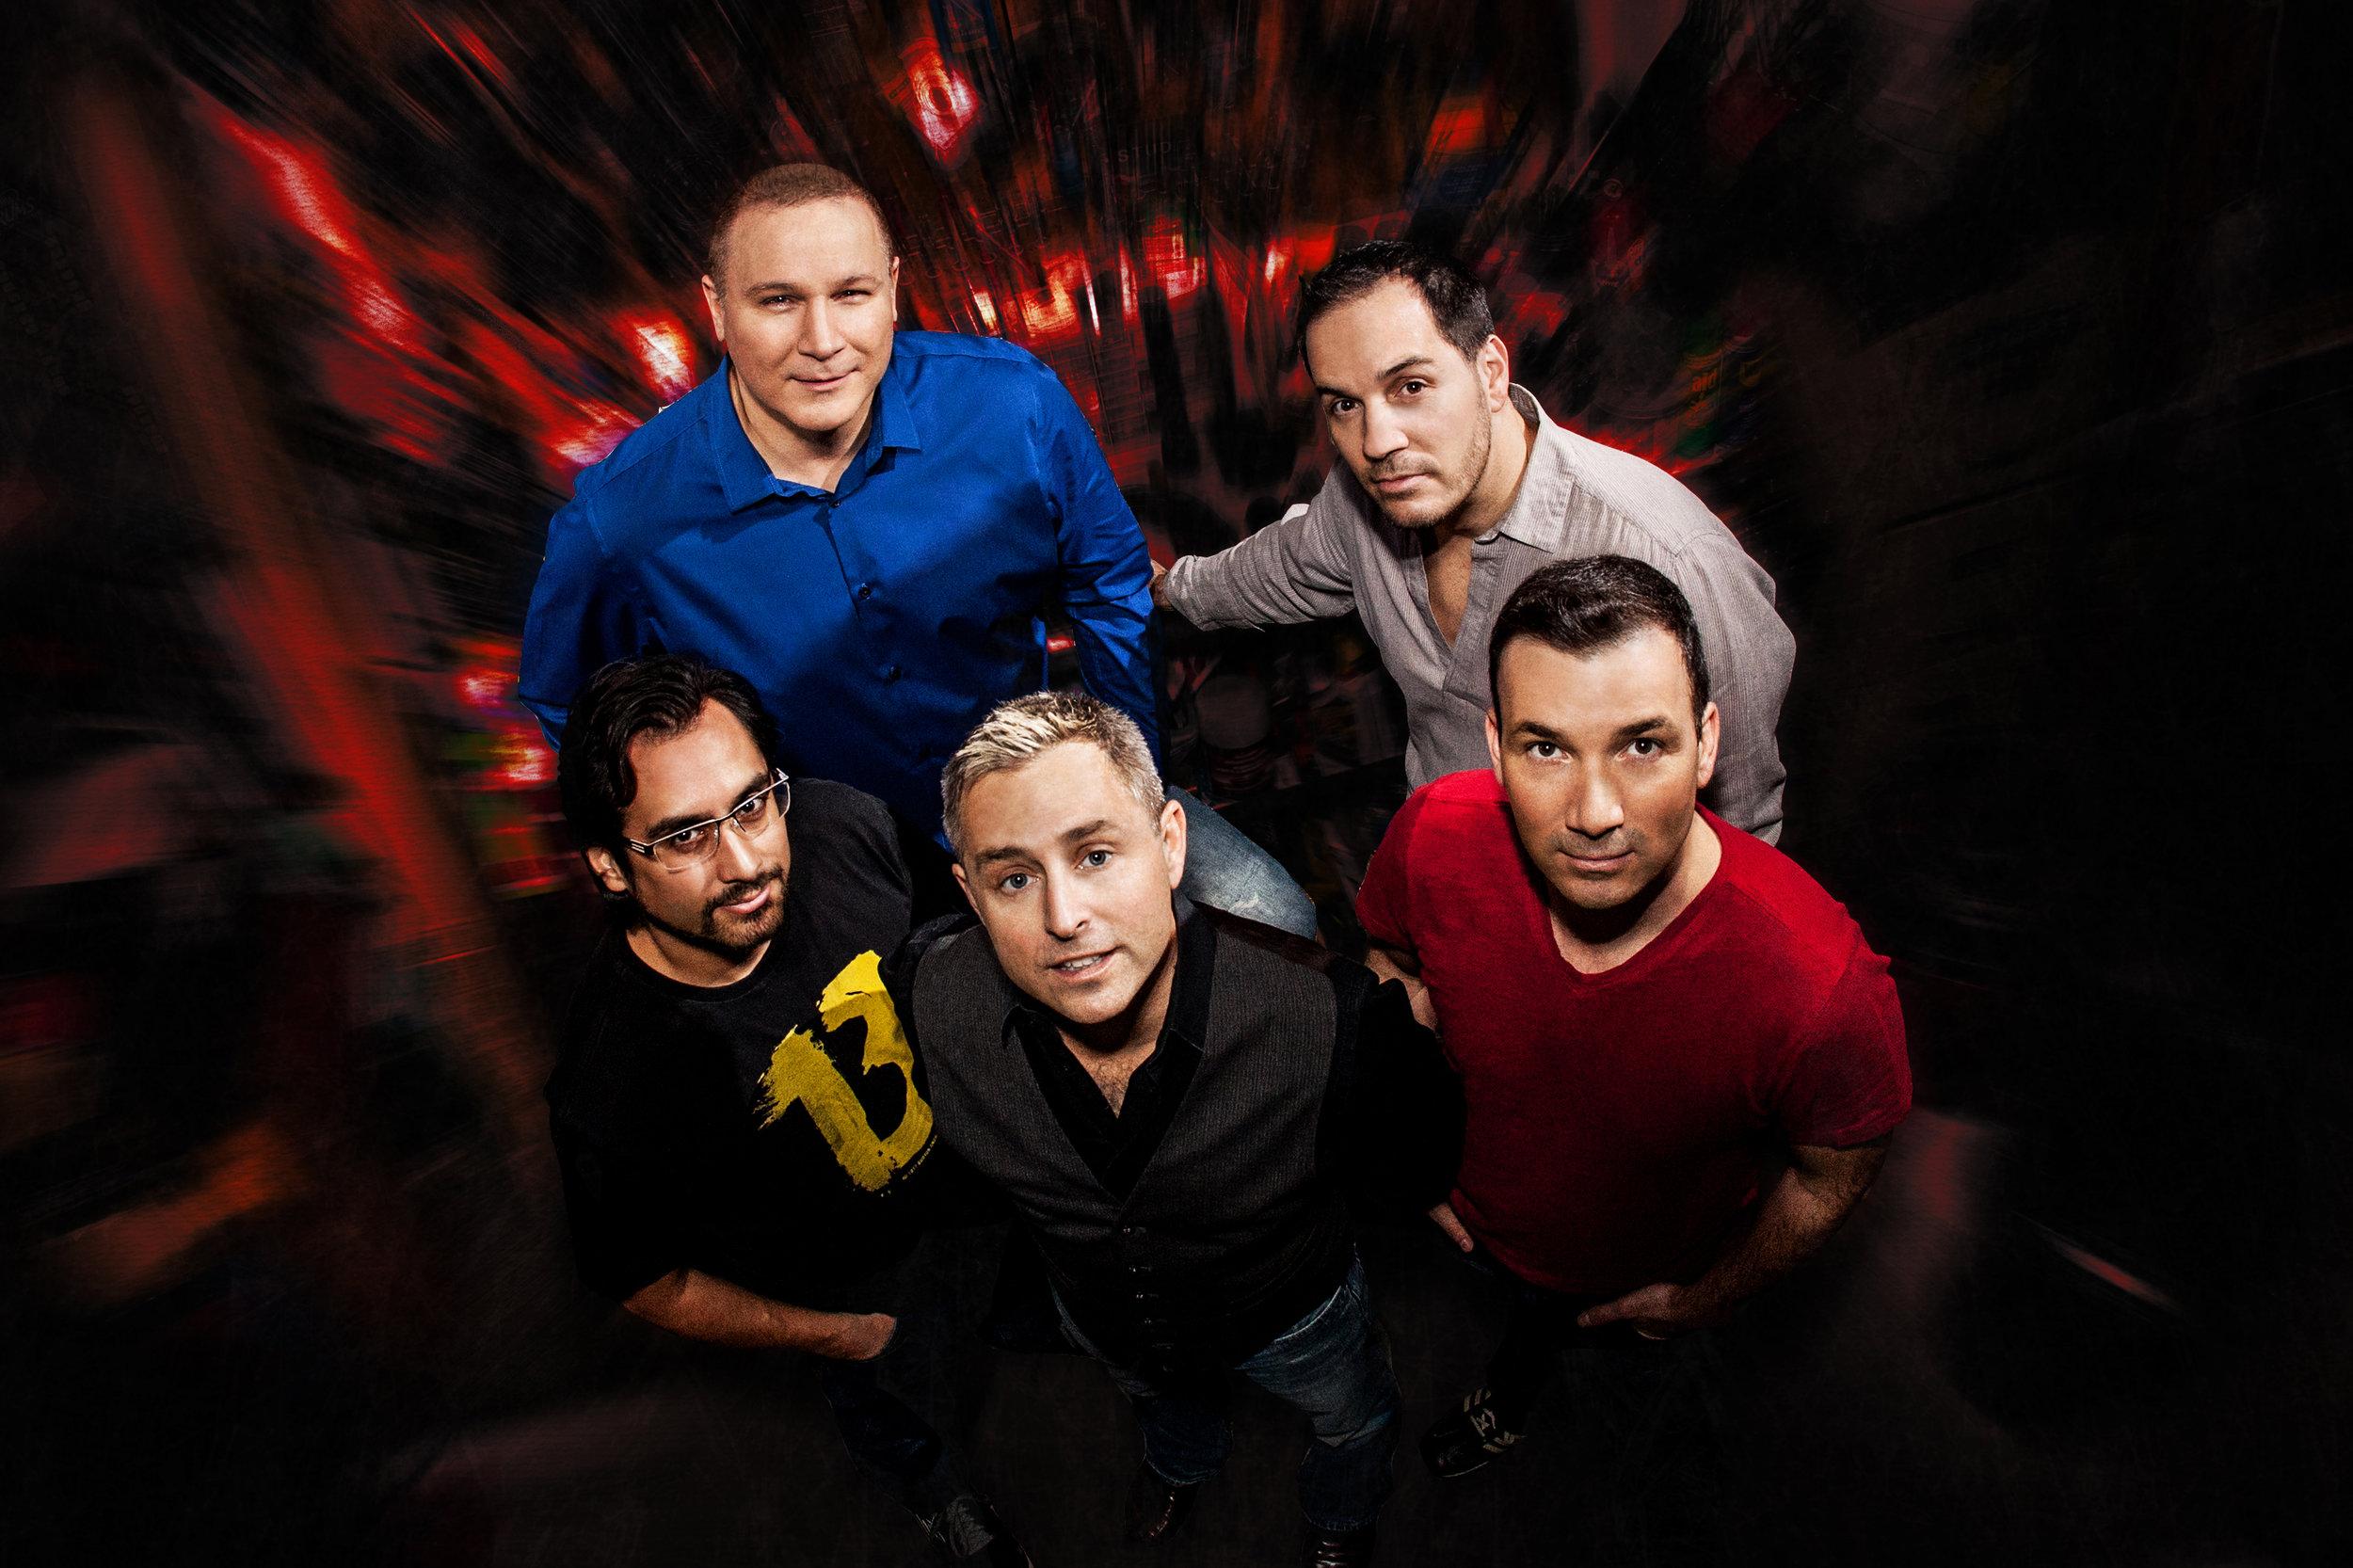 Chris Tibaldi -Drums;Jeff Herbst -Lead Vocals;Mike Maisano - Bass/Vocals;Chris Jusino - Guitar/Vocals;Robert Zanfardino - Keyboards